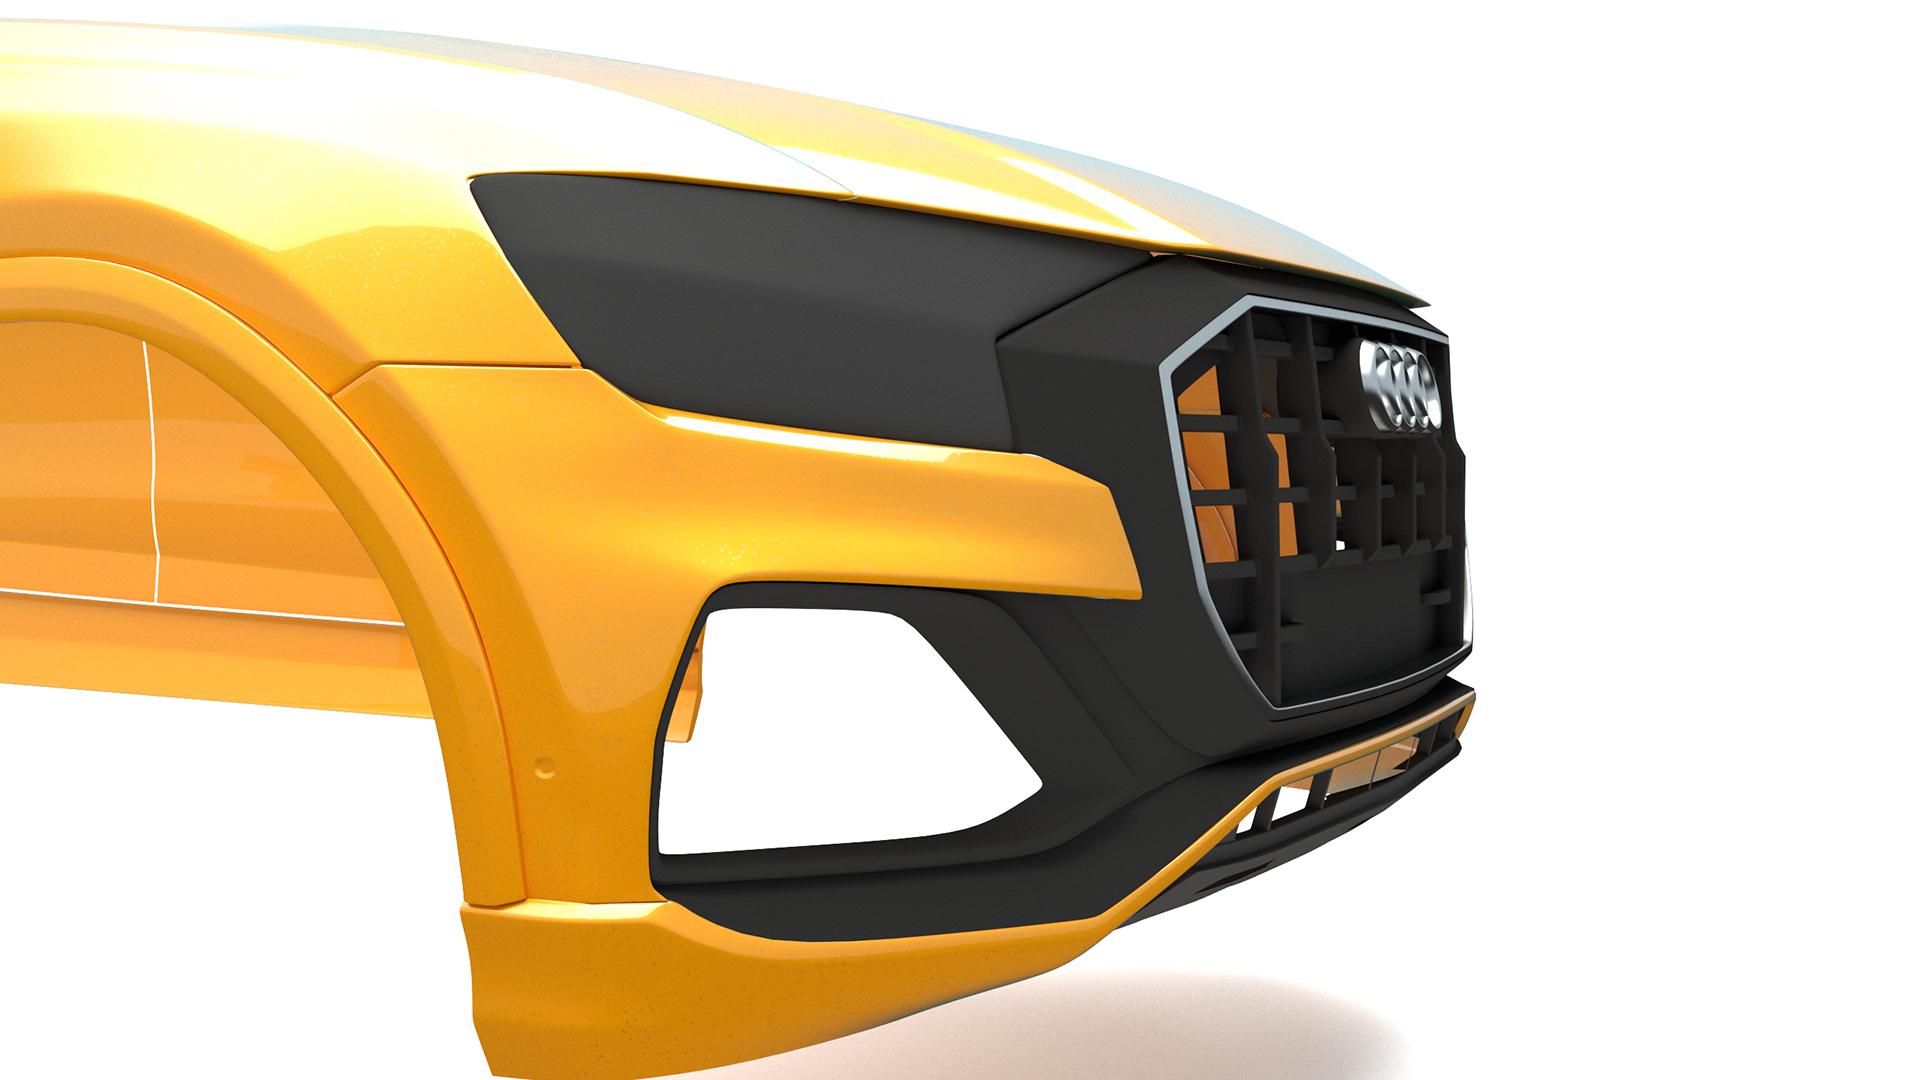 2019 Car Render Challenge - Audi Q8